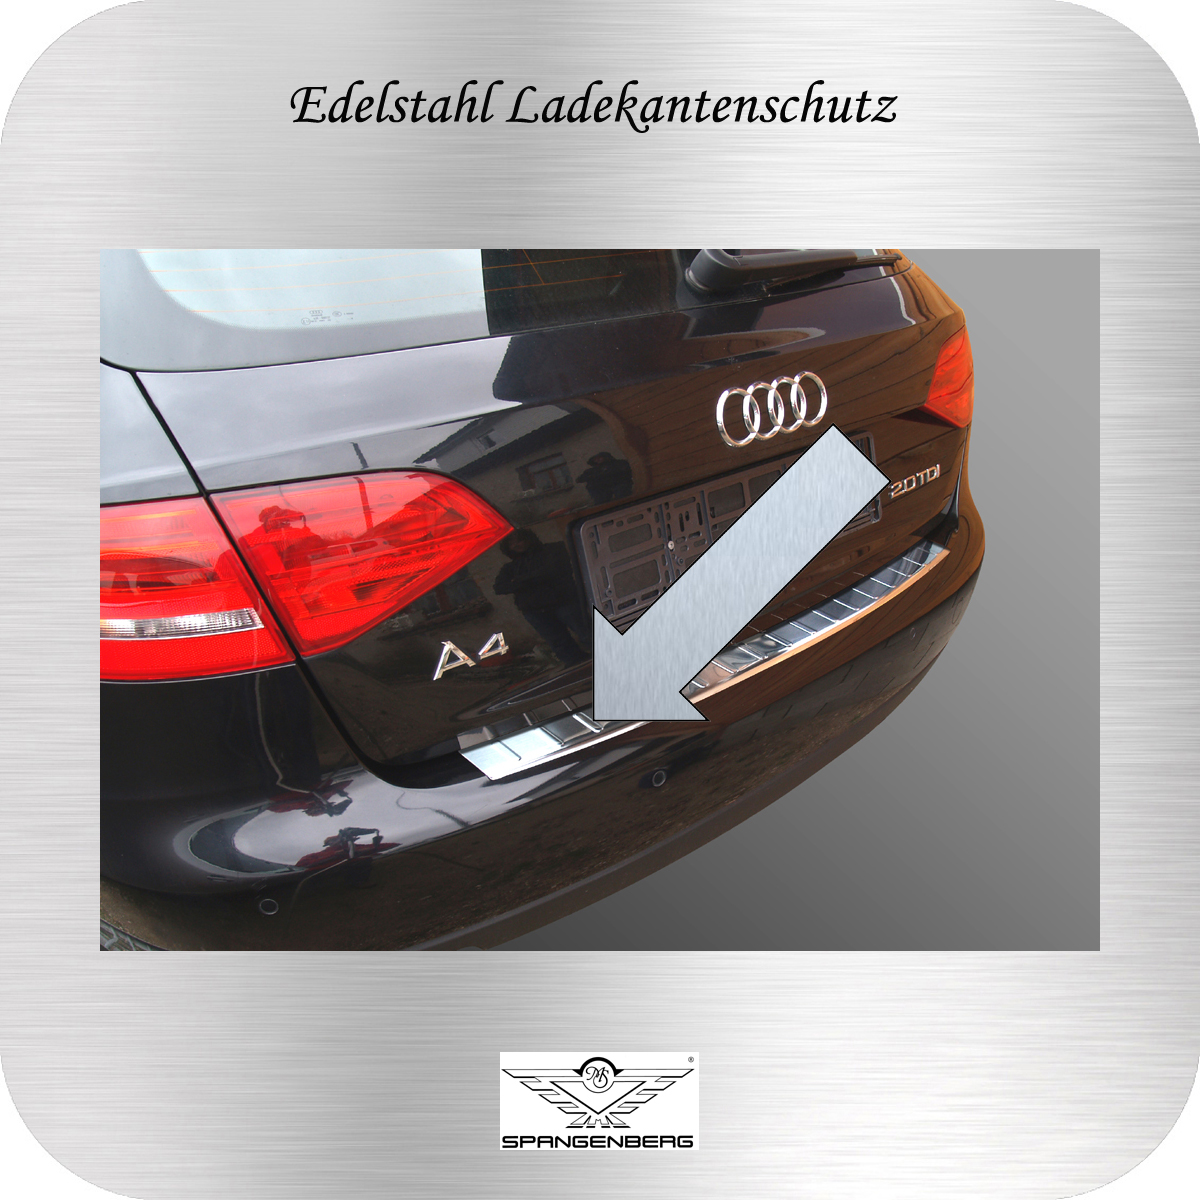 Ladekantenschutz Edelstahl Audi A4 Avant 8K5 B8 vor facelift 2008-12 3235504